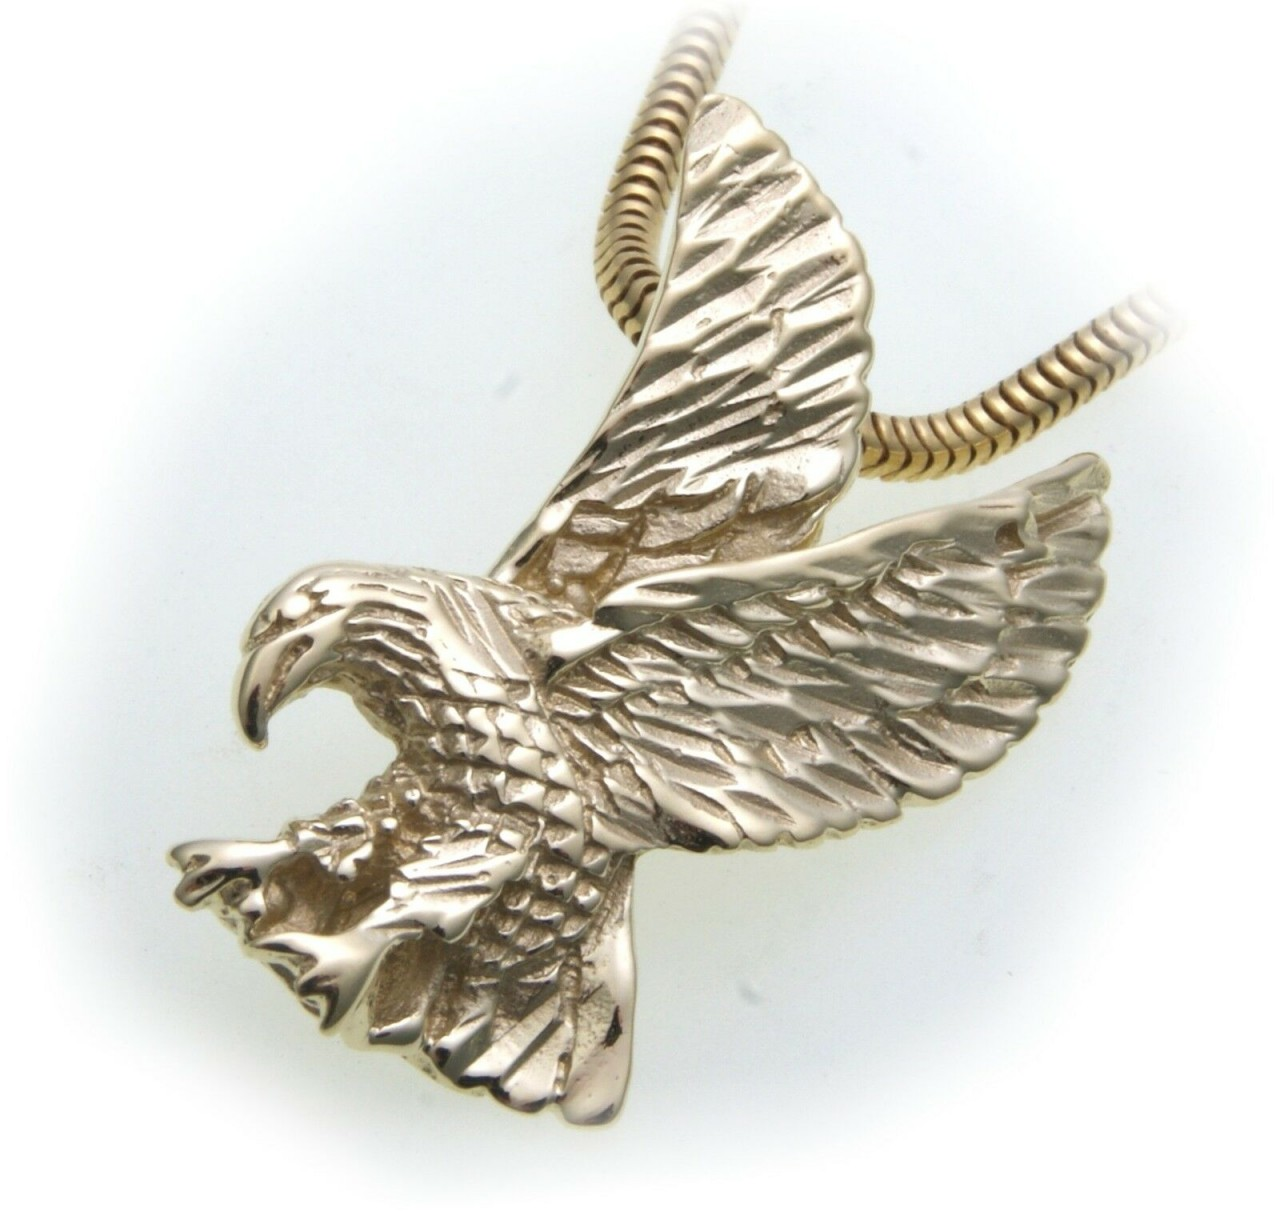 Neu Anhänger Adler echt Gold 585 Vogel 14kt Unisex Raubvogel Greifvogel Gelbgold